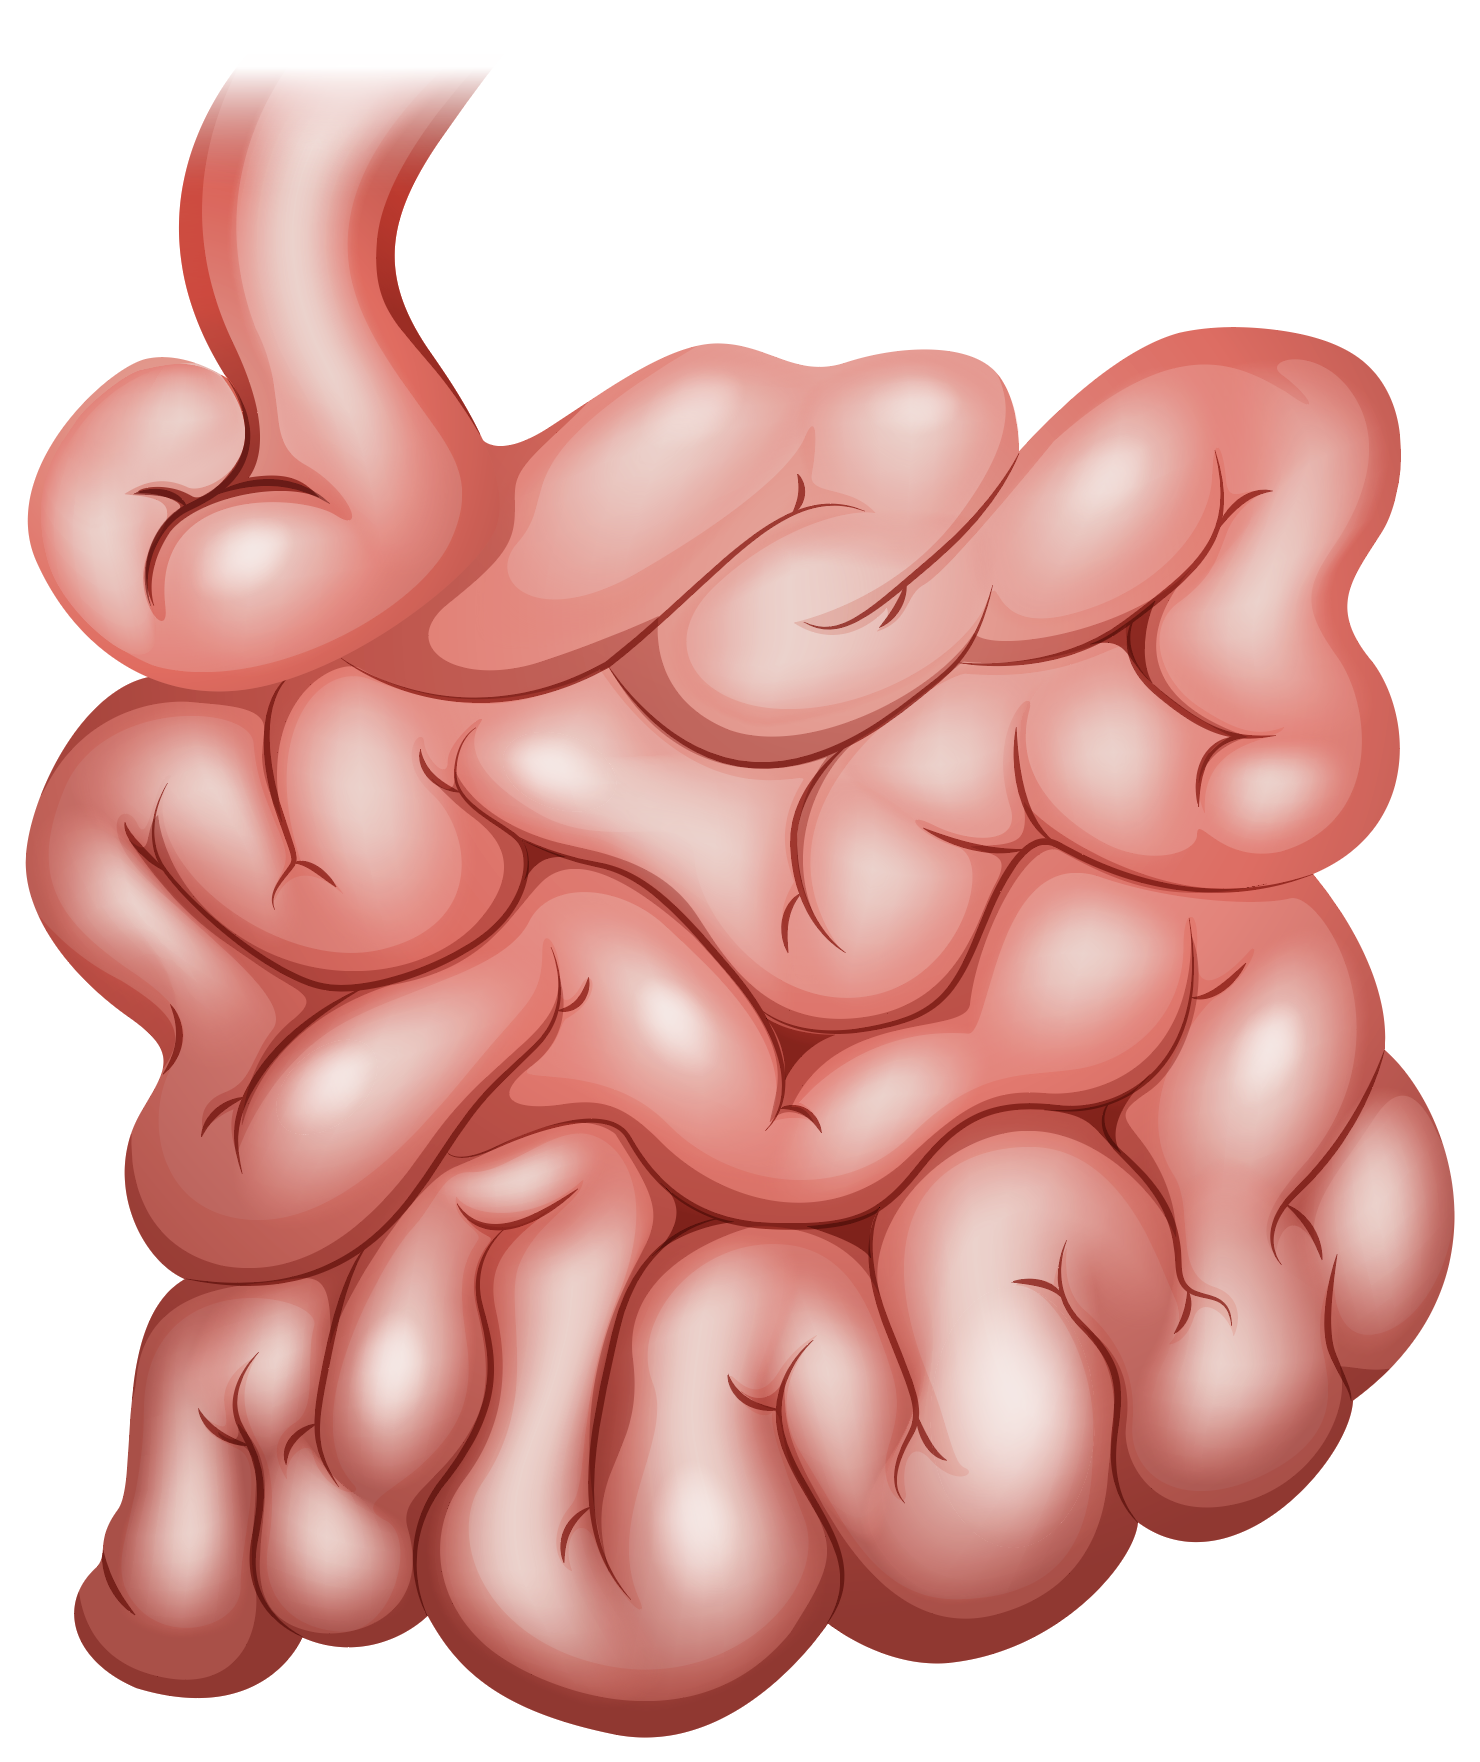 small-bowel-small-intestine